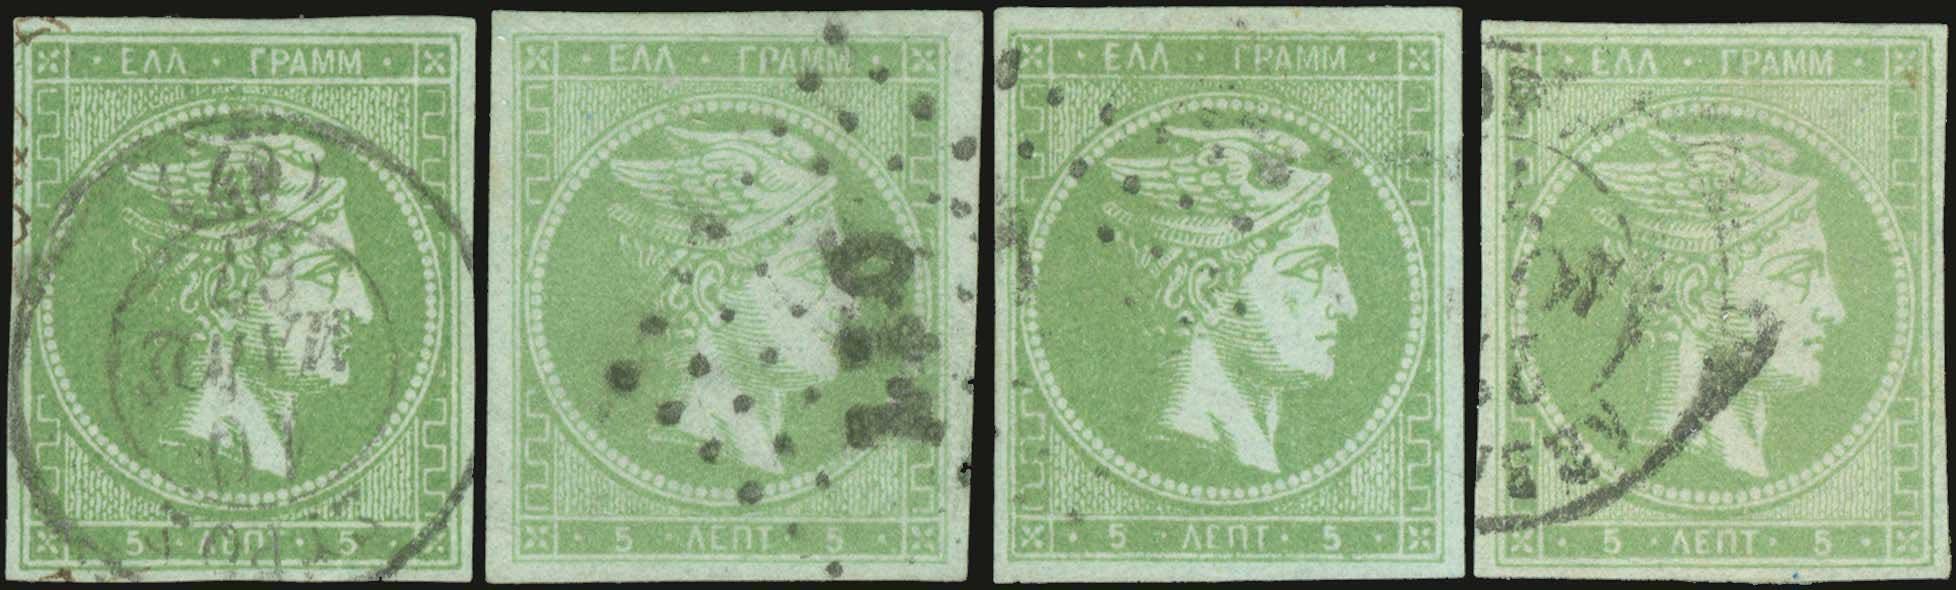 Lot 87 - -  LARGE HERMES HEAD 1862/67 consecutive athens printings -  A. Karamitsos Public & Live Internet Auction 683